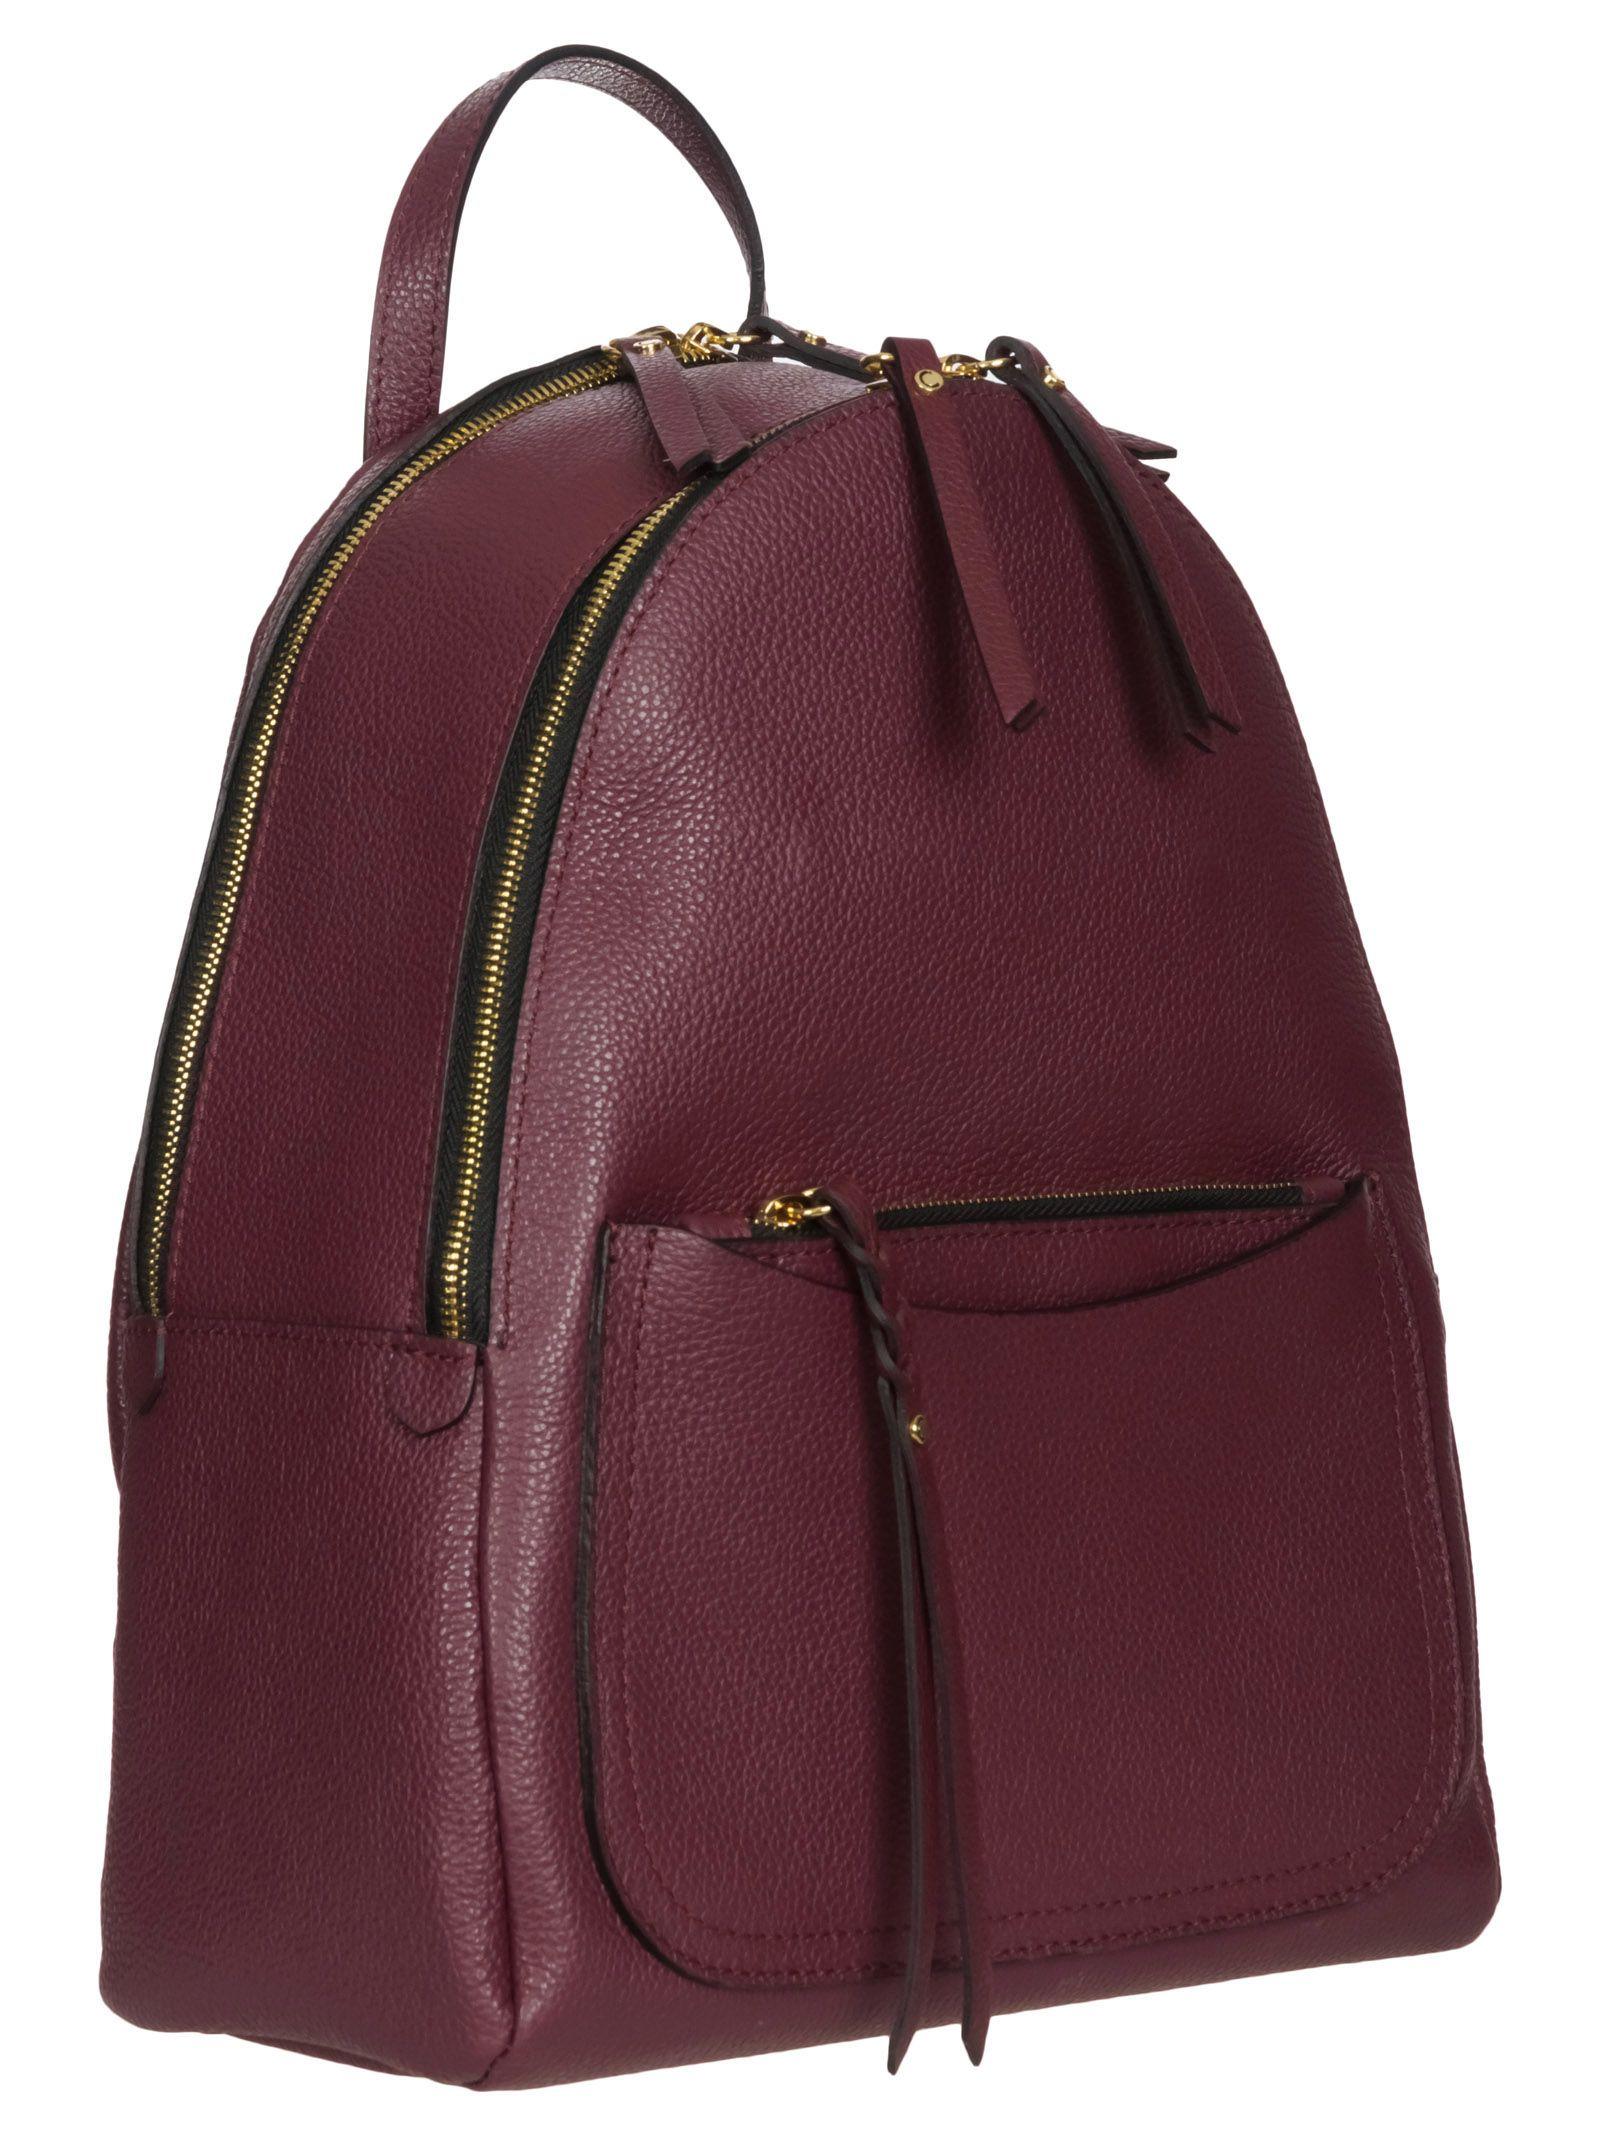 GIANNI CHIARINI Merlot Leather Backpack